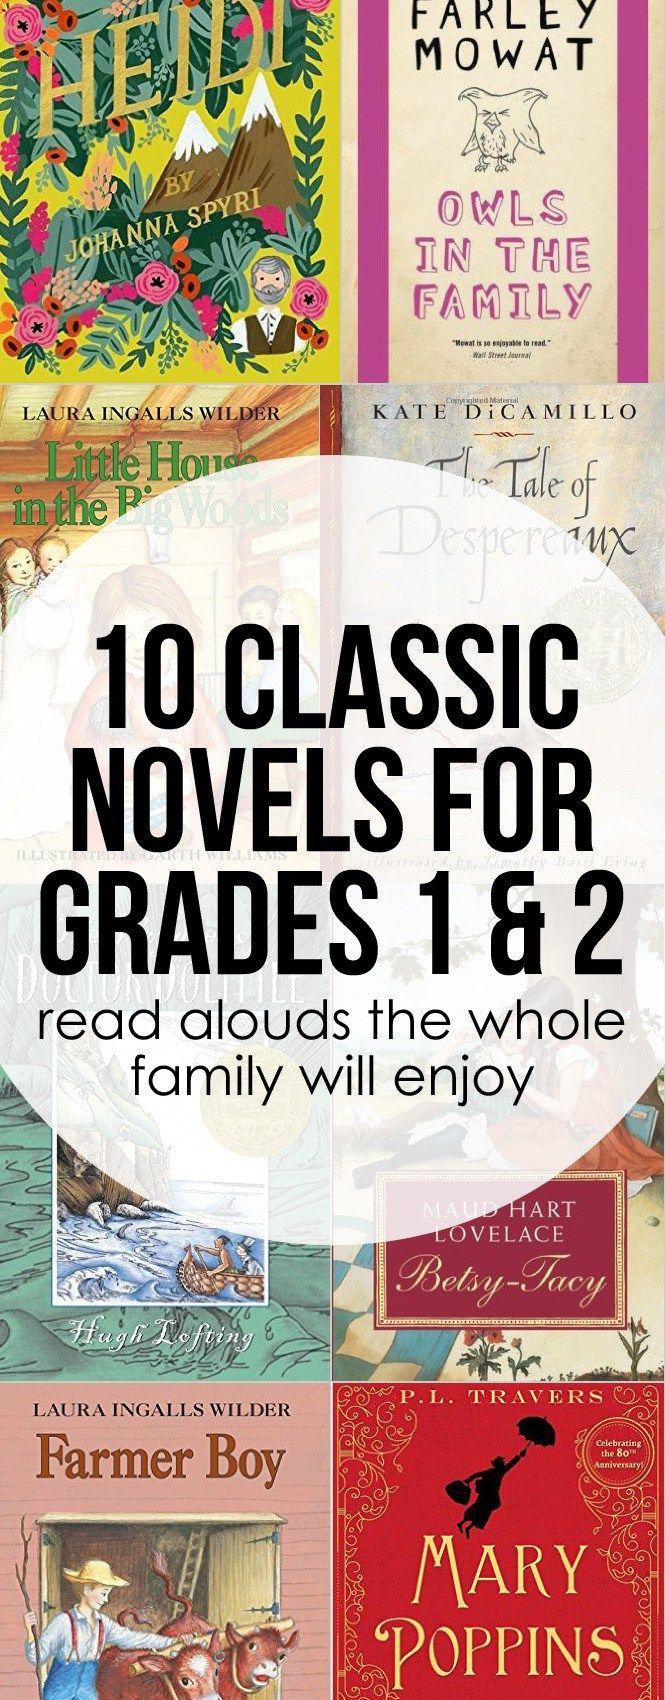 Classic Novels for Grades 1 & 2 | Read aloud books, Kids ...